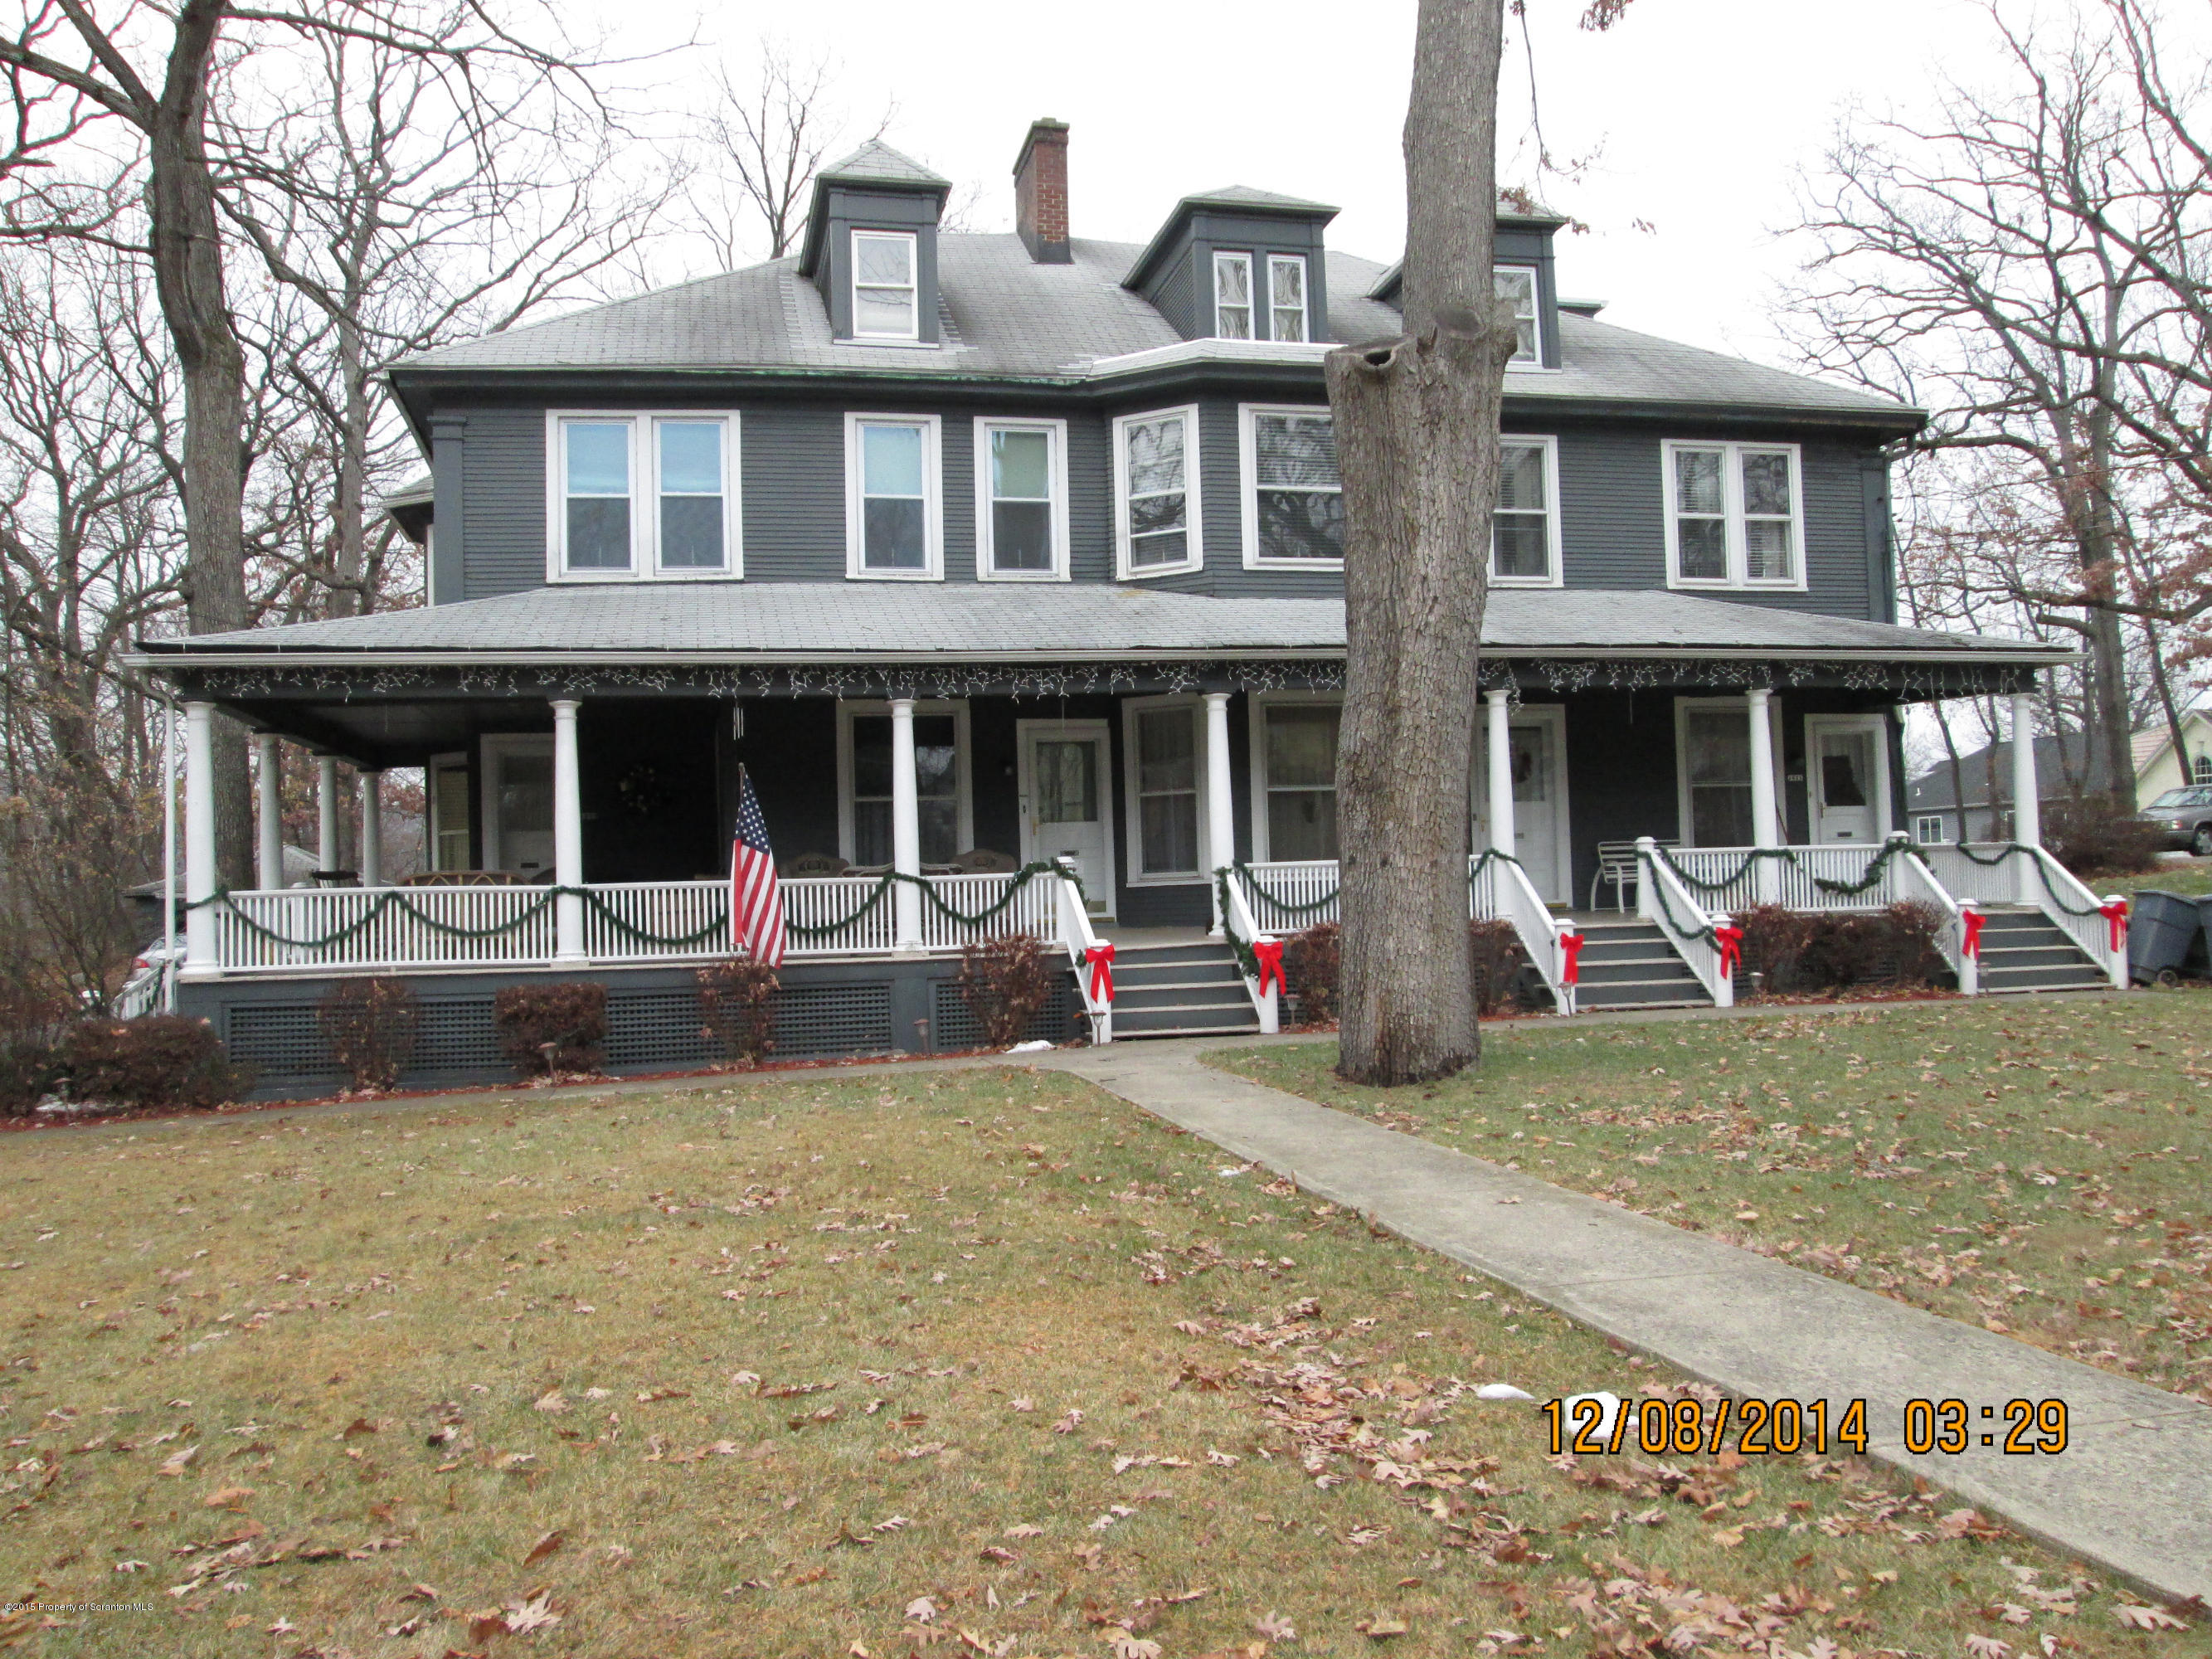 1609 Monroe Ave, Dunmore, Pennsylvania 18509, 1 Bedroom Bedrooms, 5 Rooms Rooms,2 BathroomsBathrooms,Rental,For Lease,Monroe,20-407